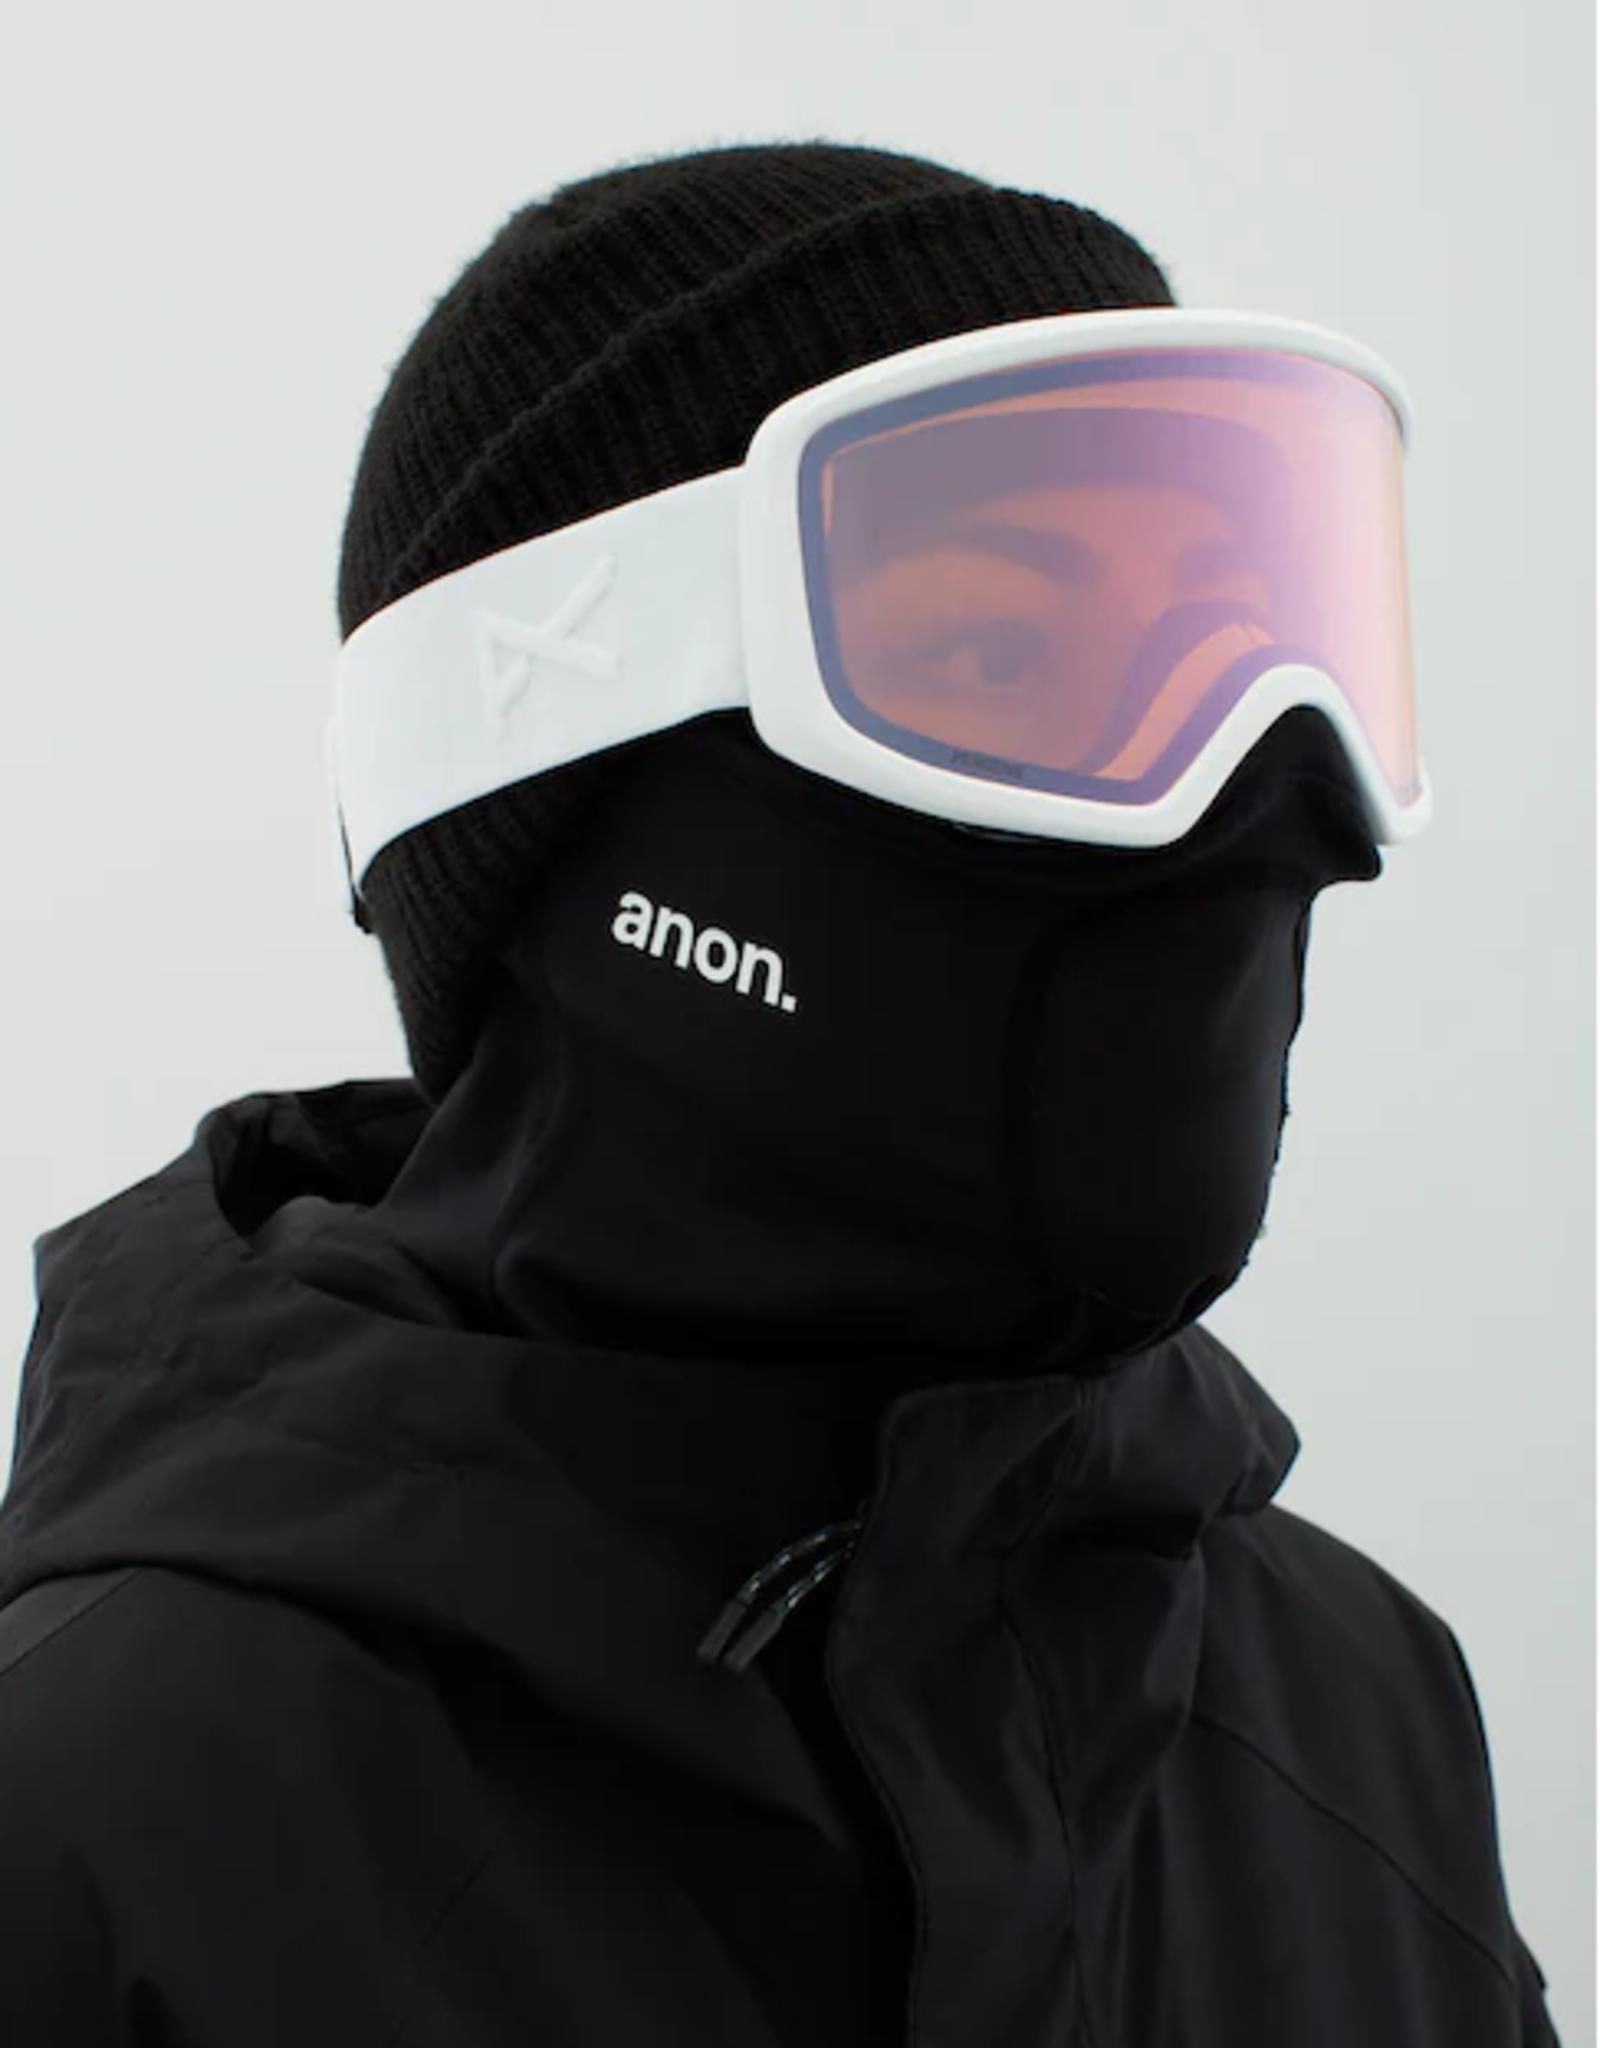 Anon Anon - DERINGER MFI - White w/ PERCEIVE Cloudy Pink + BONUS Lens + Facemask